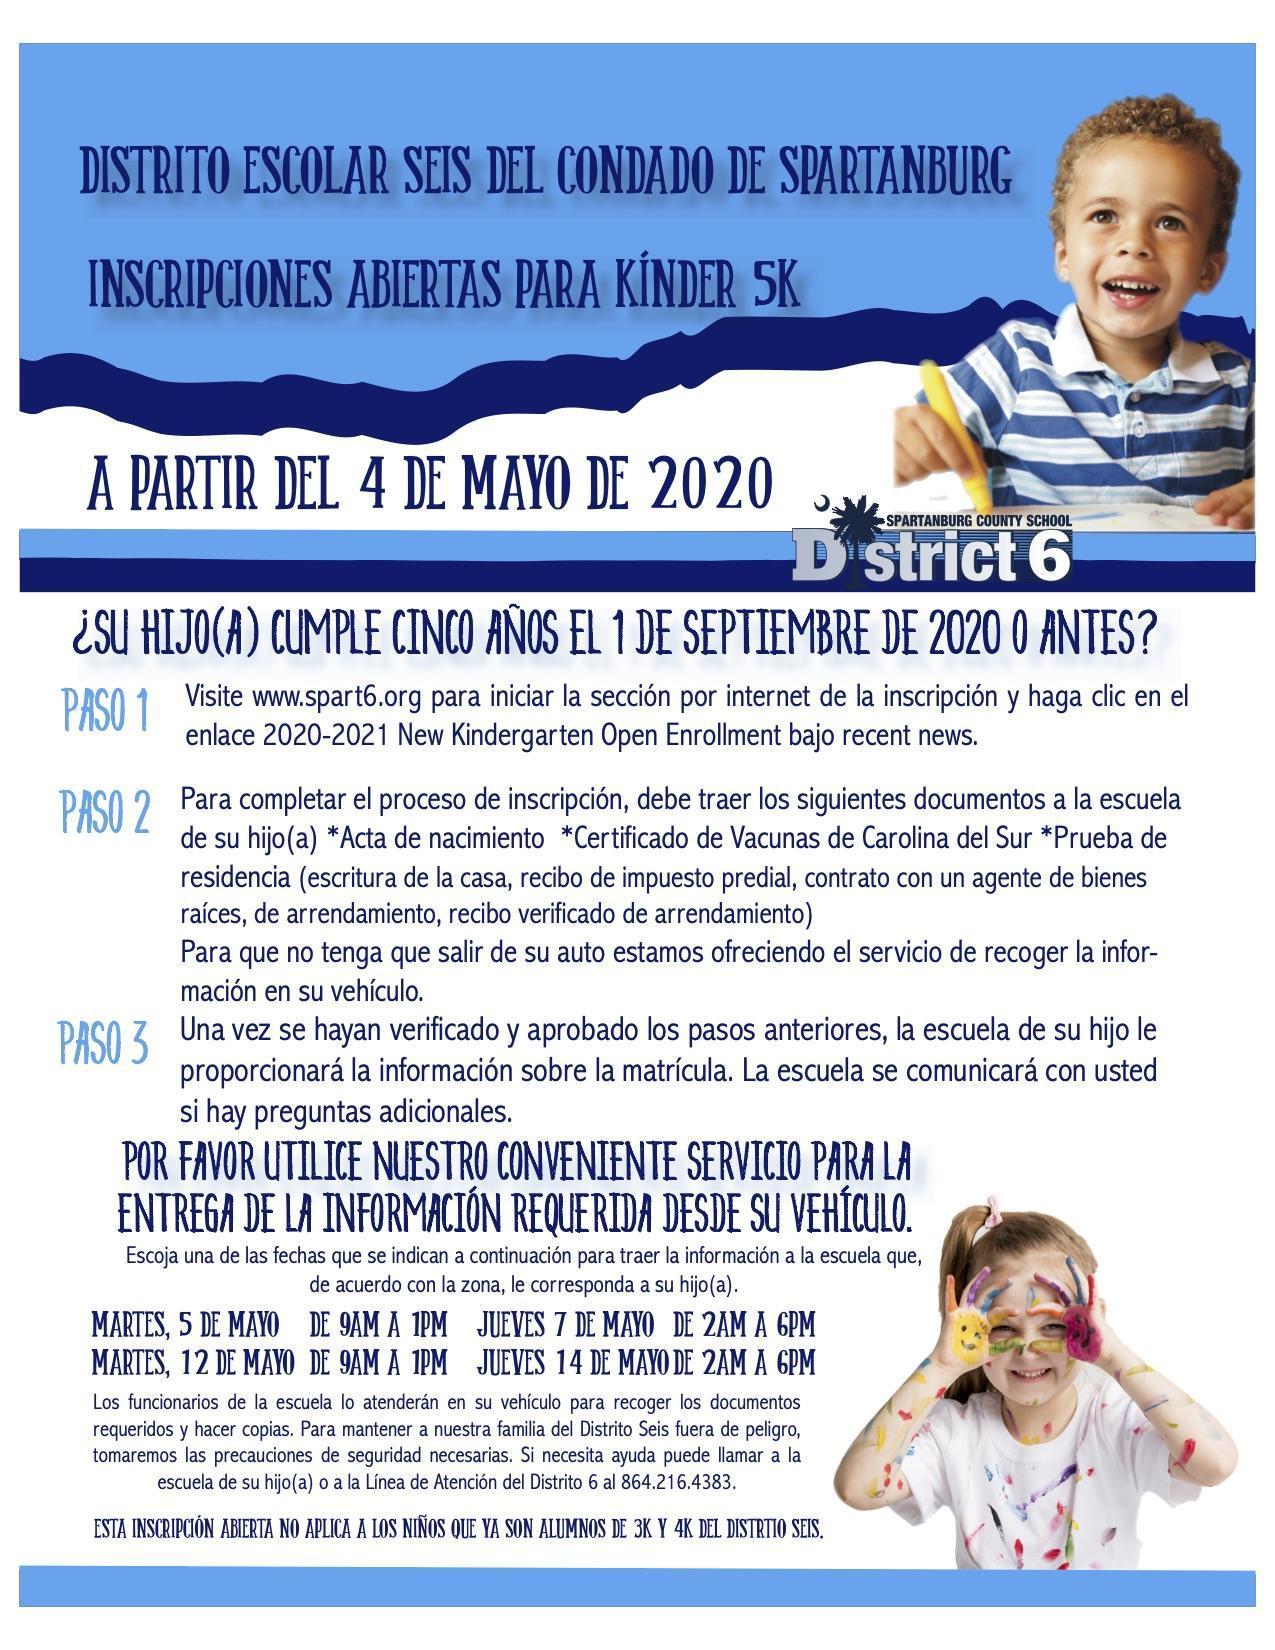 Kindergarten Open Enrollment Flyer in Spanish